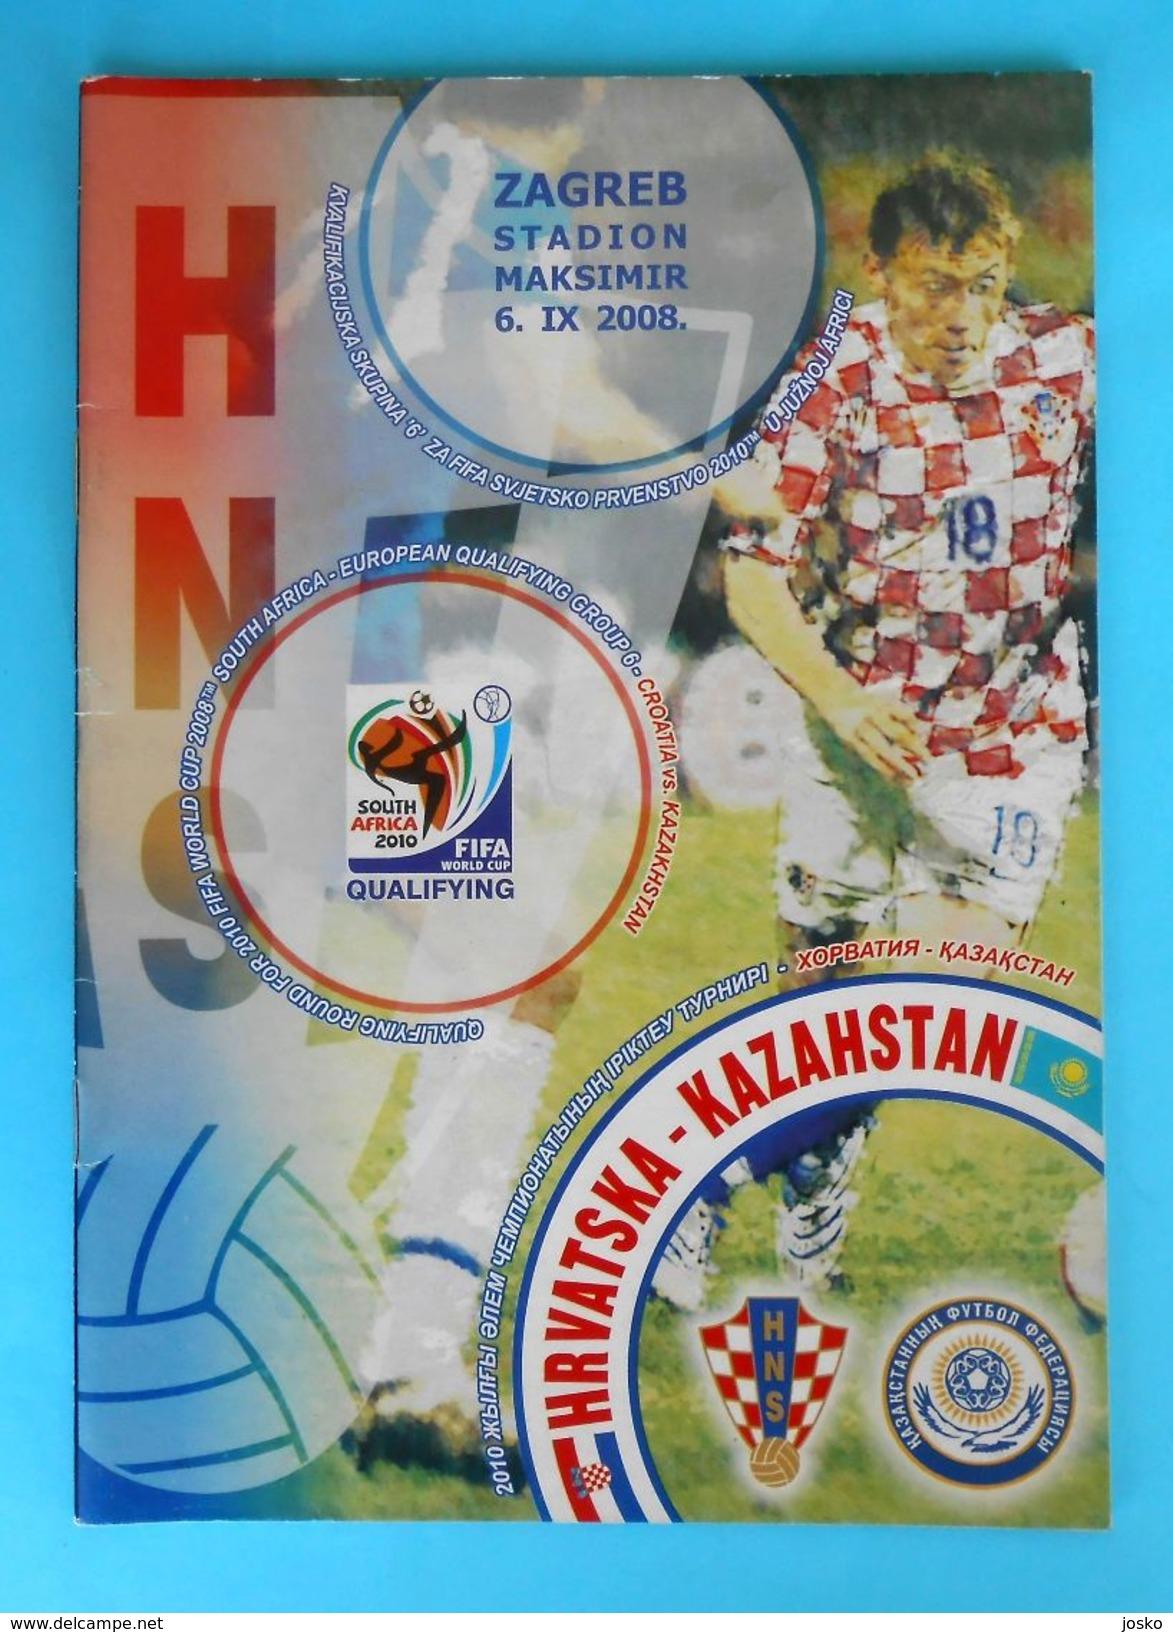 CROATIA V KAZAKHSTAN - 2010 FIFA WORLD CUP Qualif. Football Match Programme * Soccer Fussball Programm Programma Croatie - Books